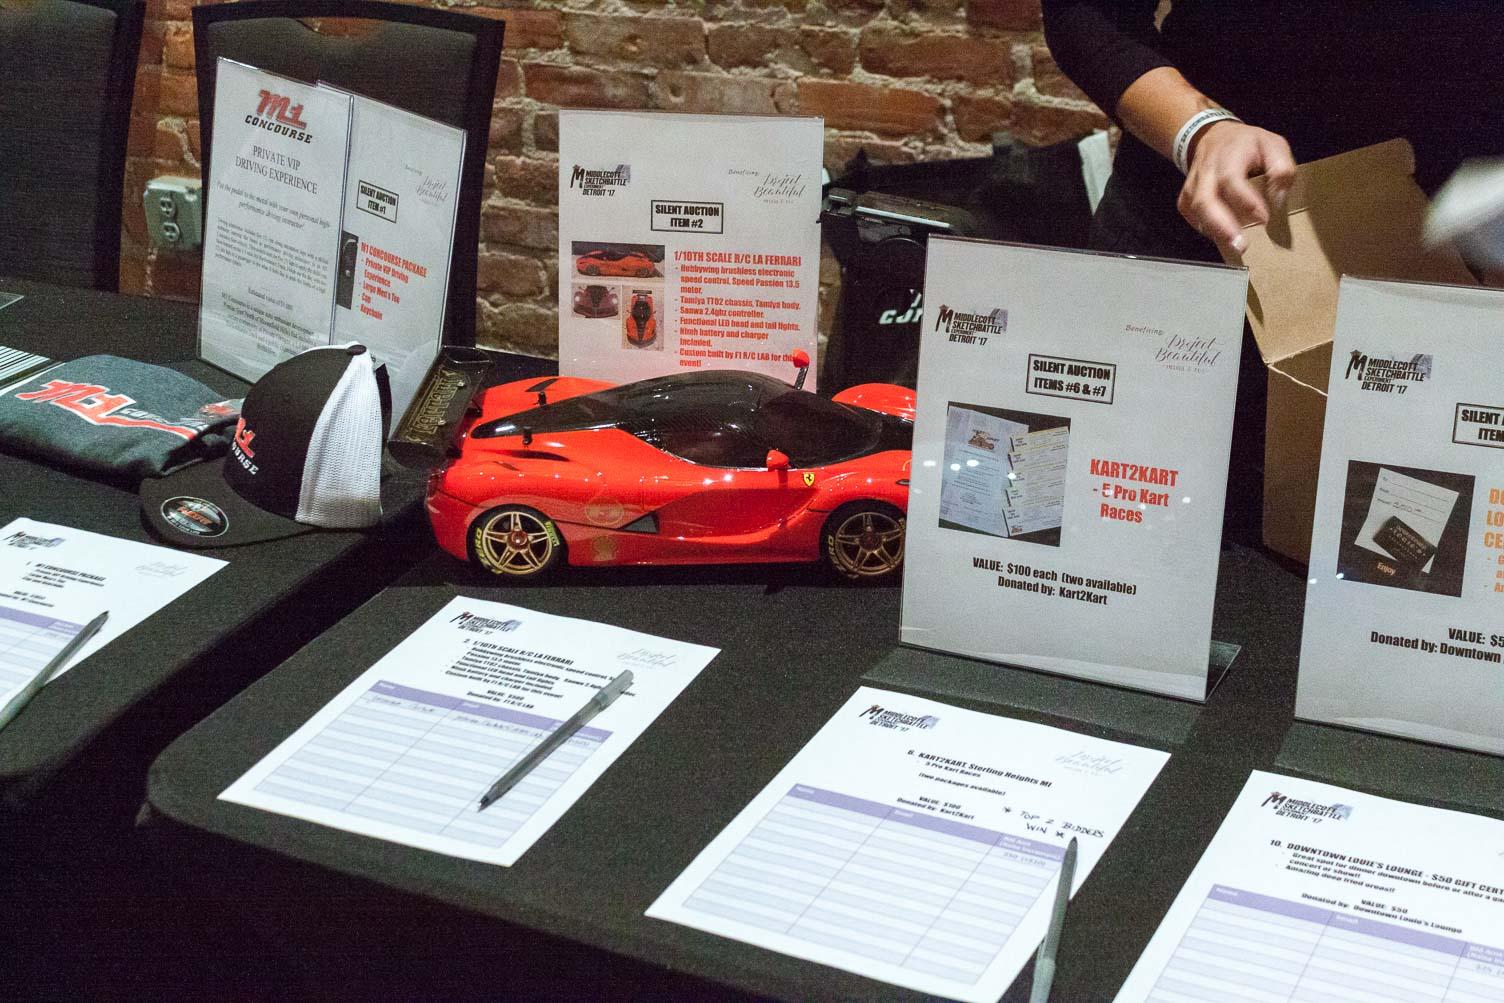 Awesome LaFerrari R/C car donated by F1 R/C Lab!